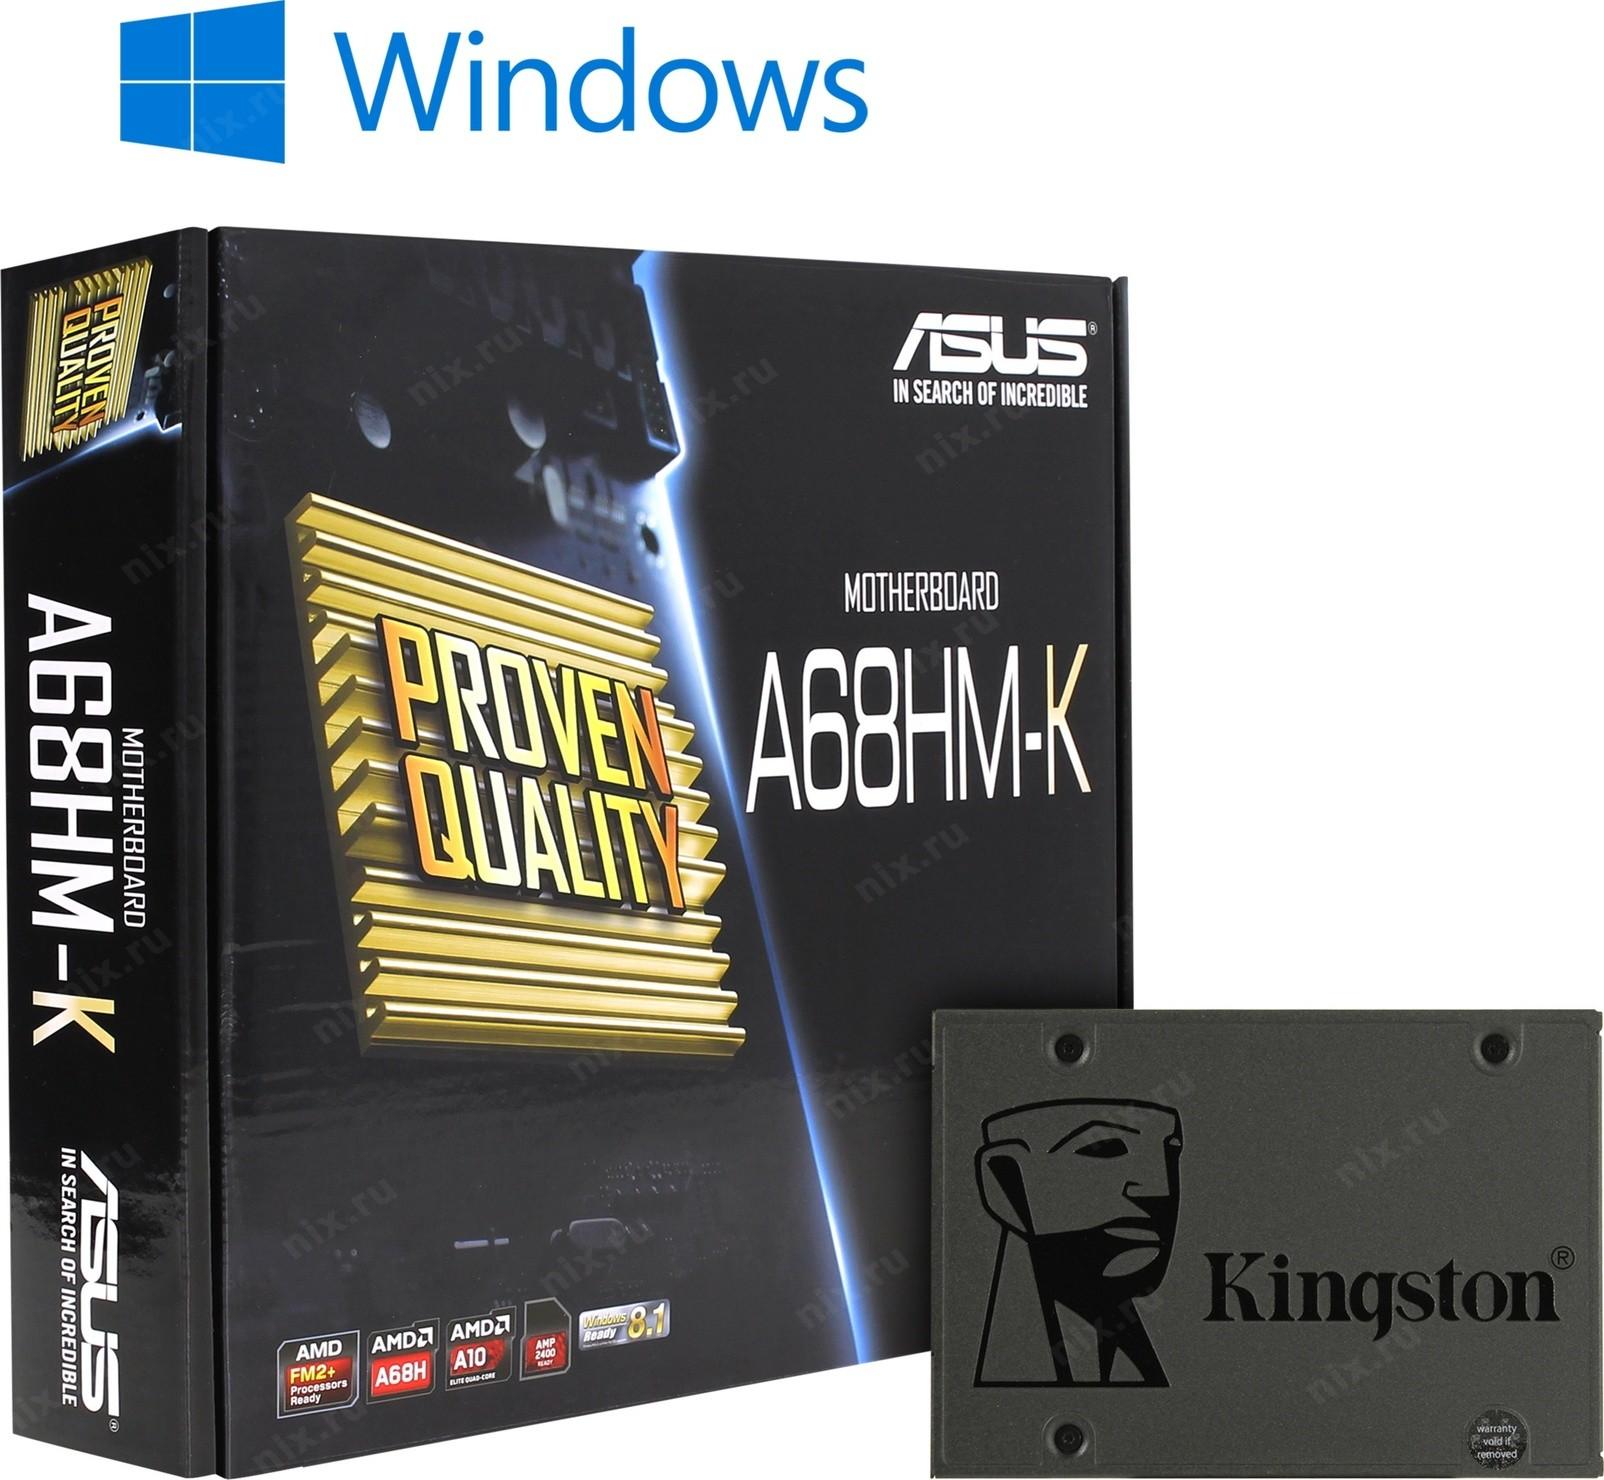 Asus A68hm K Kingston Sa400s37 120g Windows 10 Home Motherboard Socket Fm2 Sl